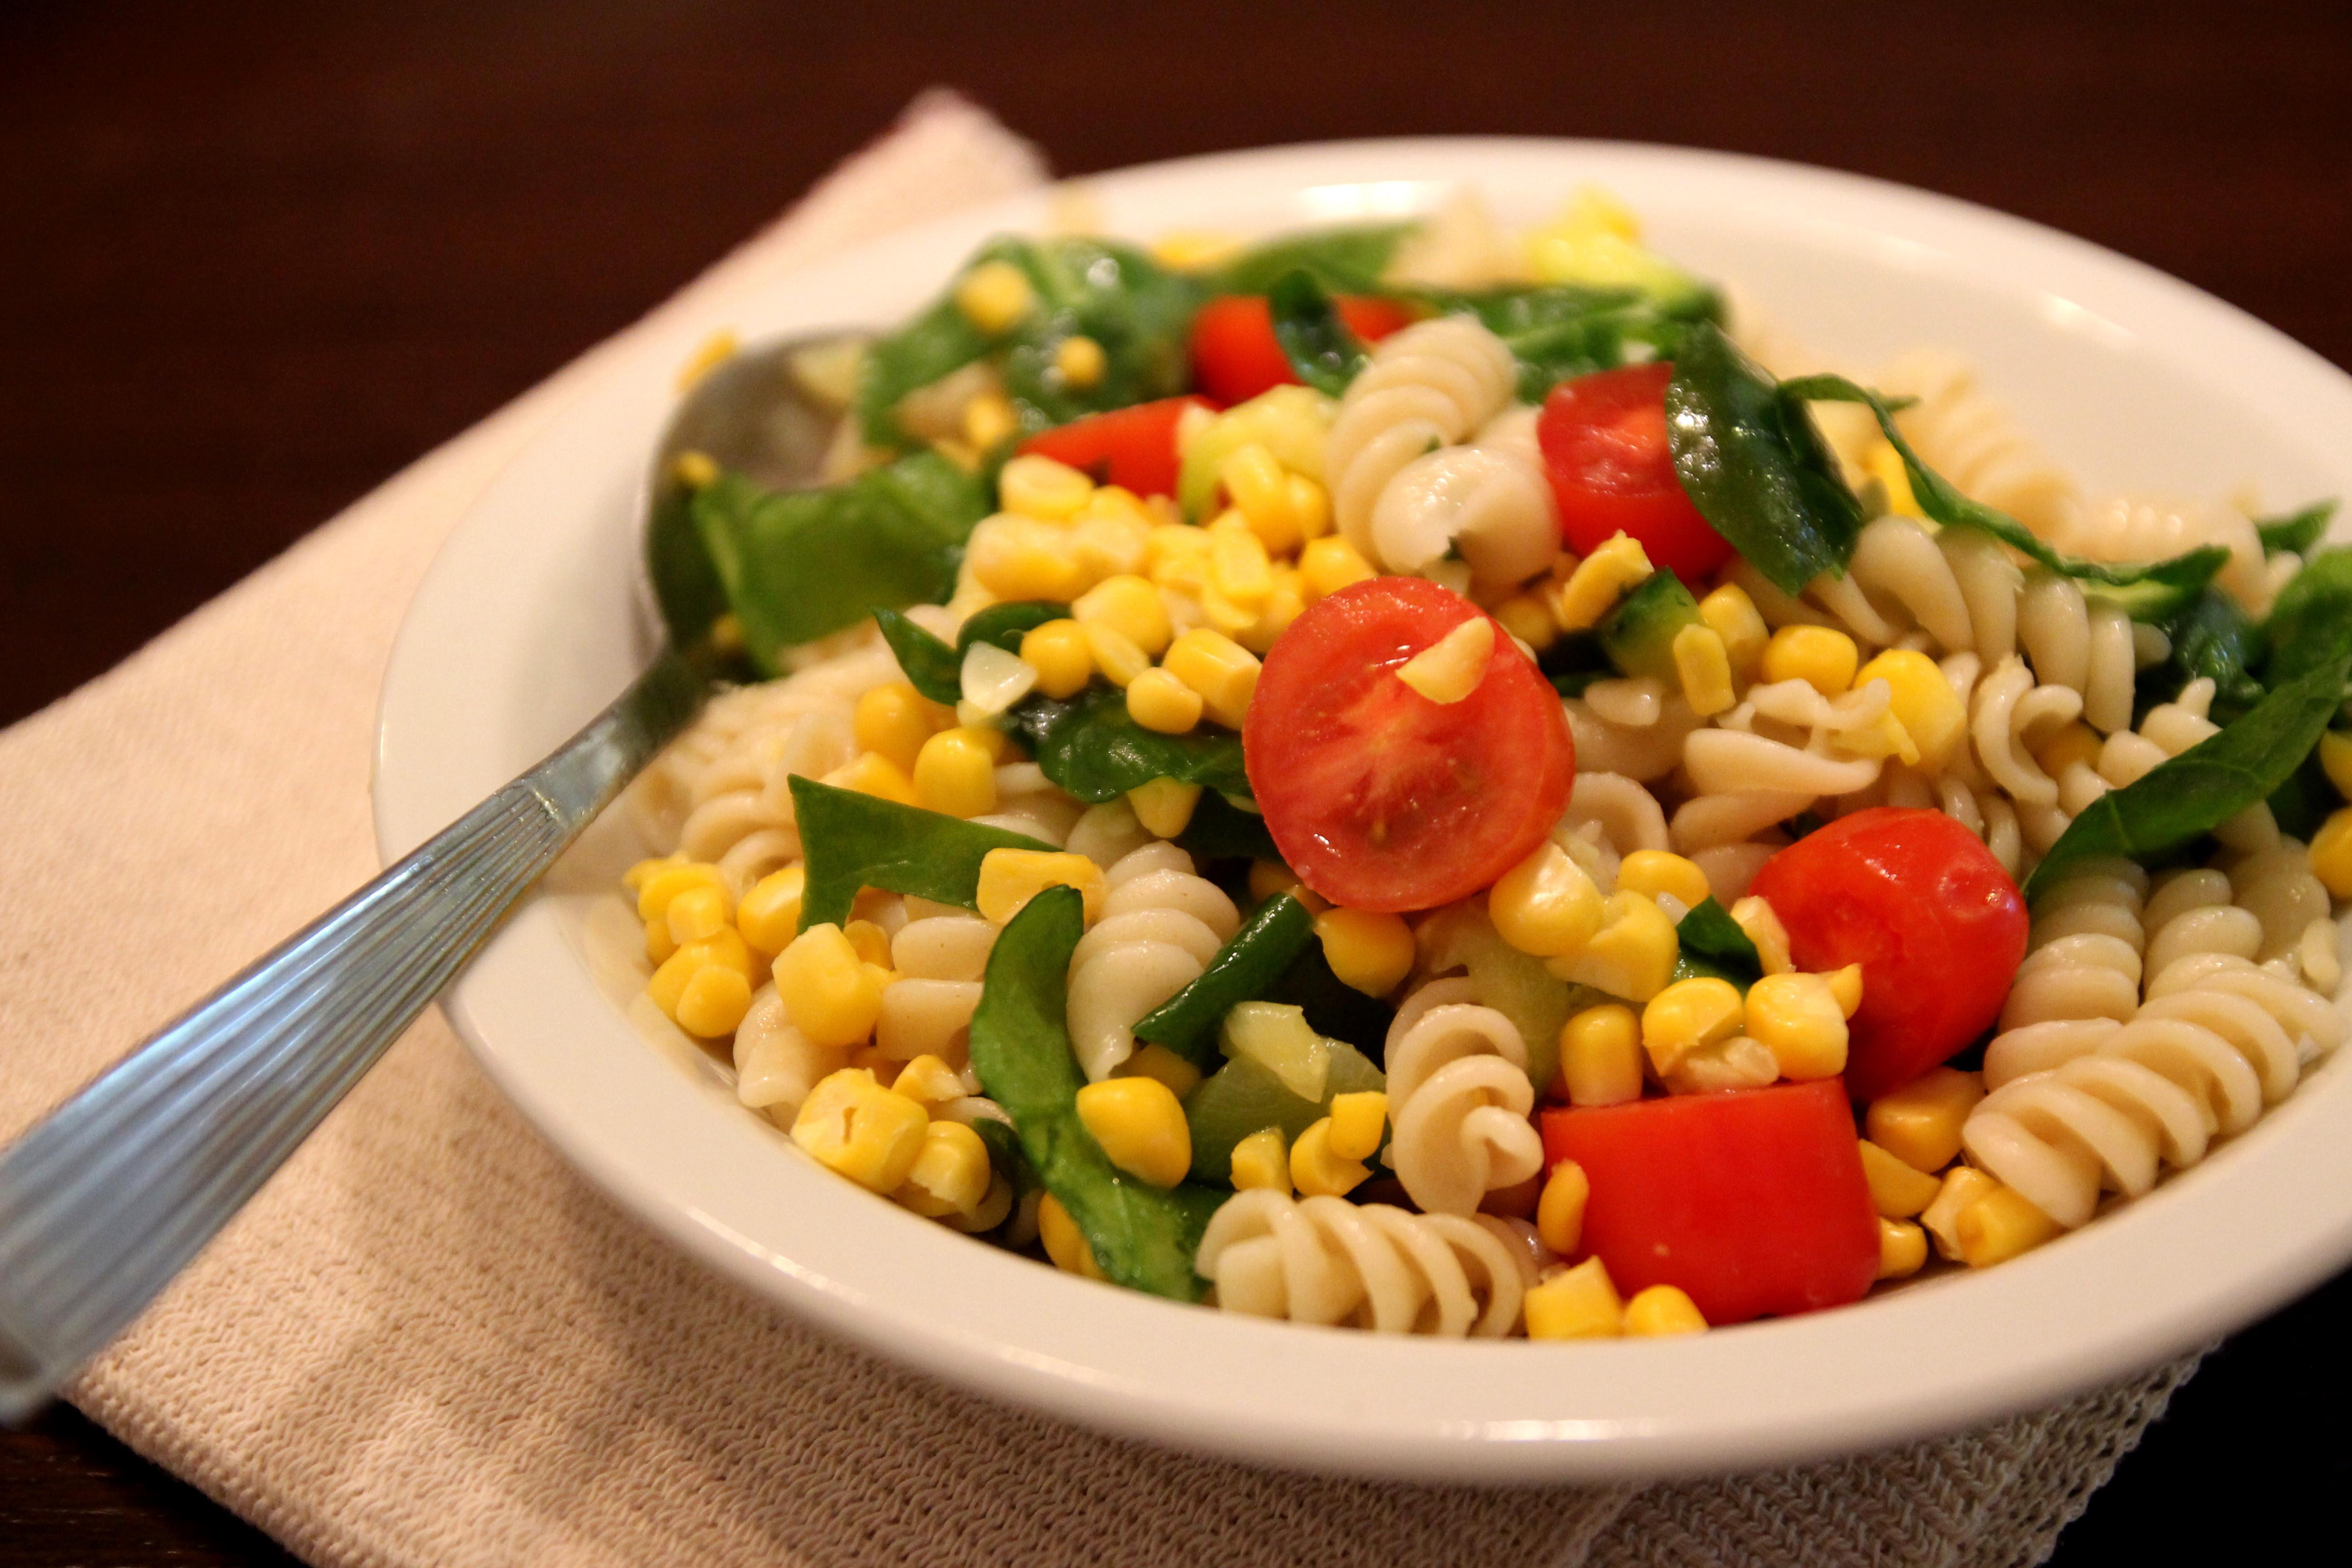 Colorful Vegetable Pasta Salad14